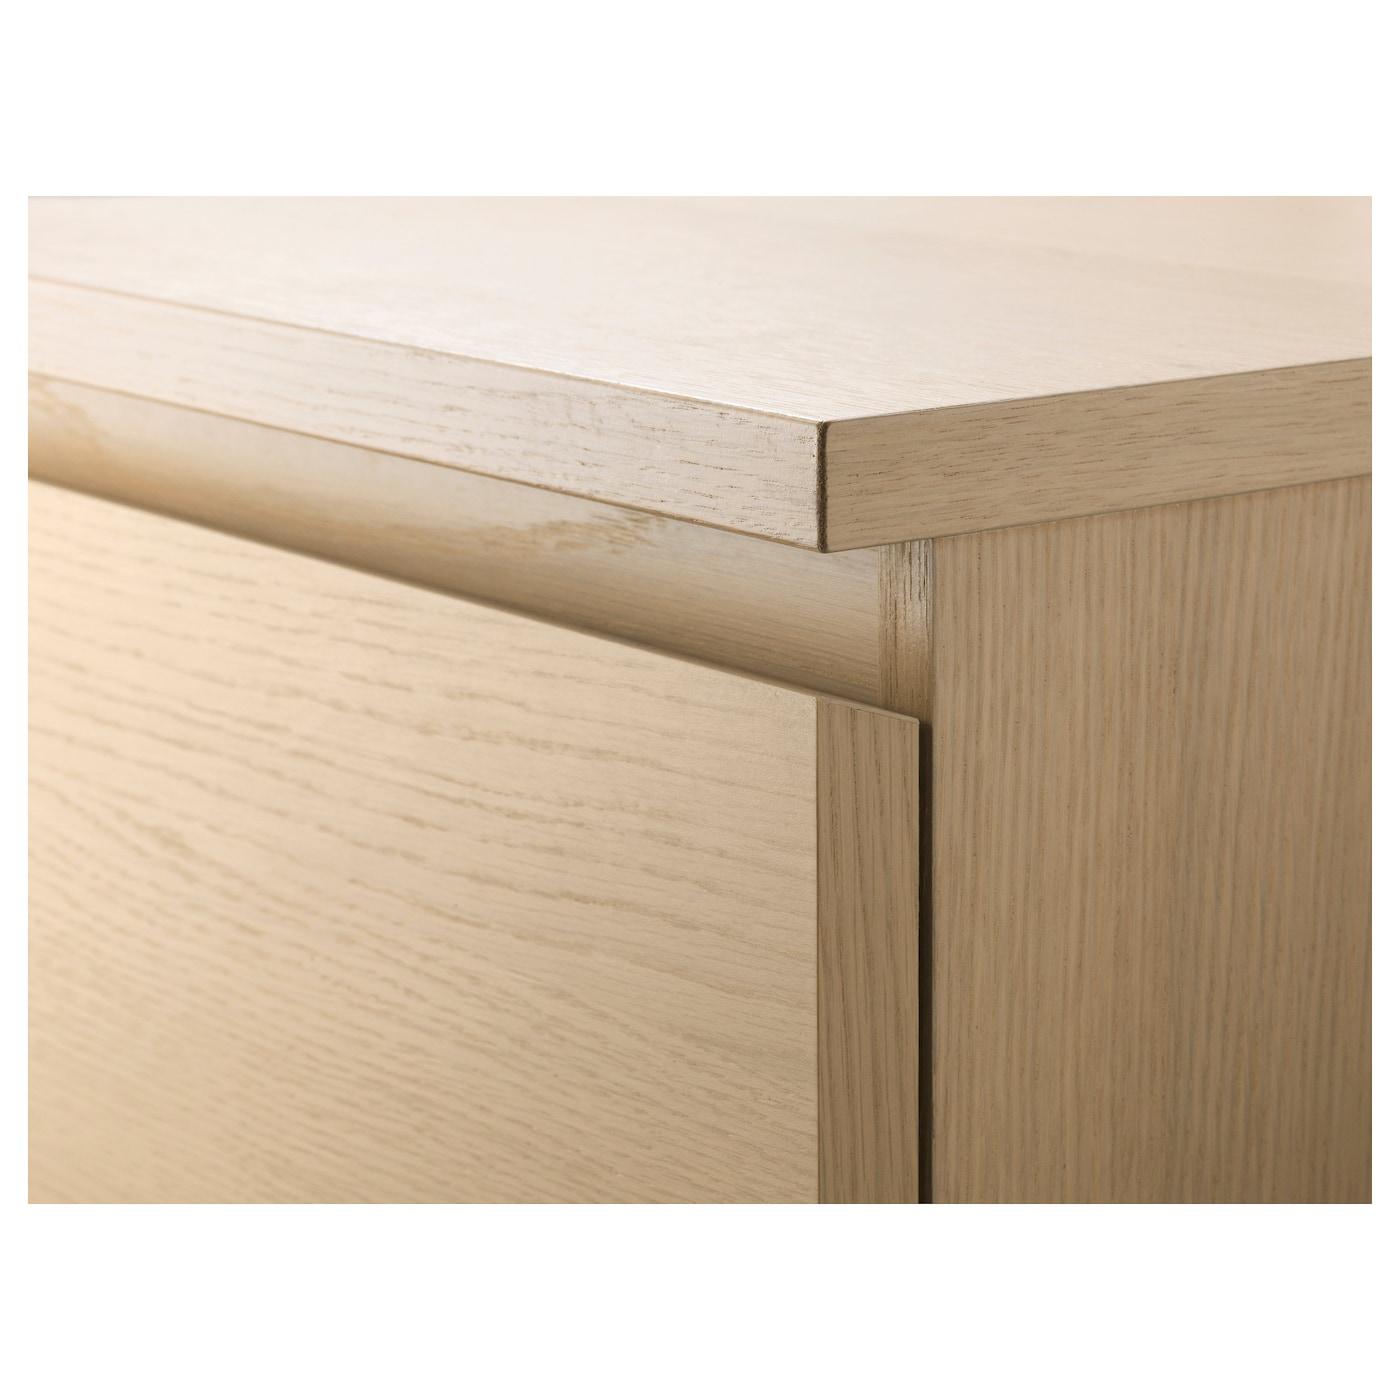 MALM chest of 4 drawers white stained oak veneer 80 cm 48 cm 100 cm 72 cm 43 cm